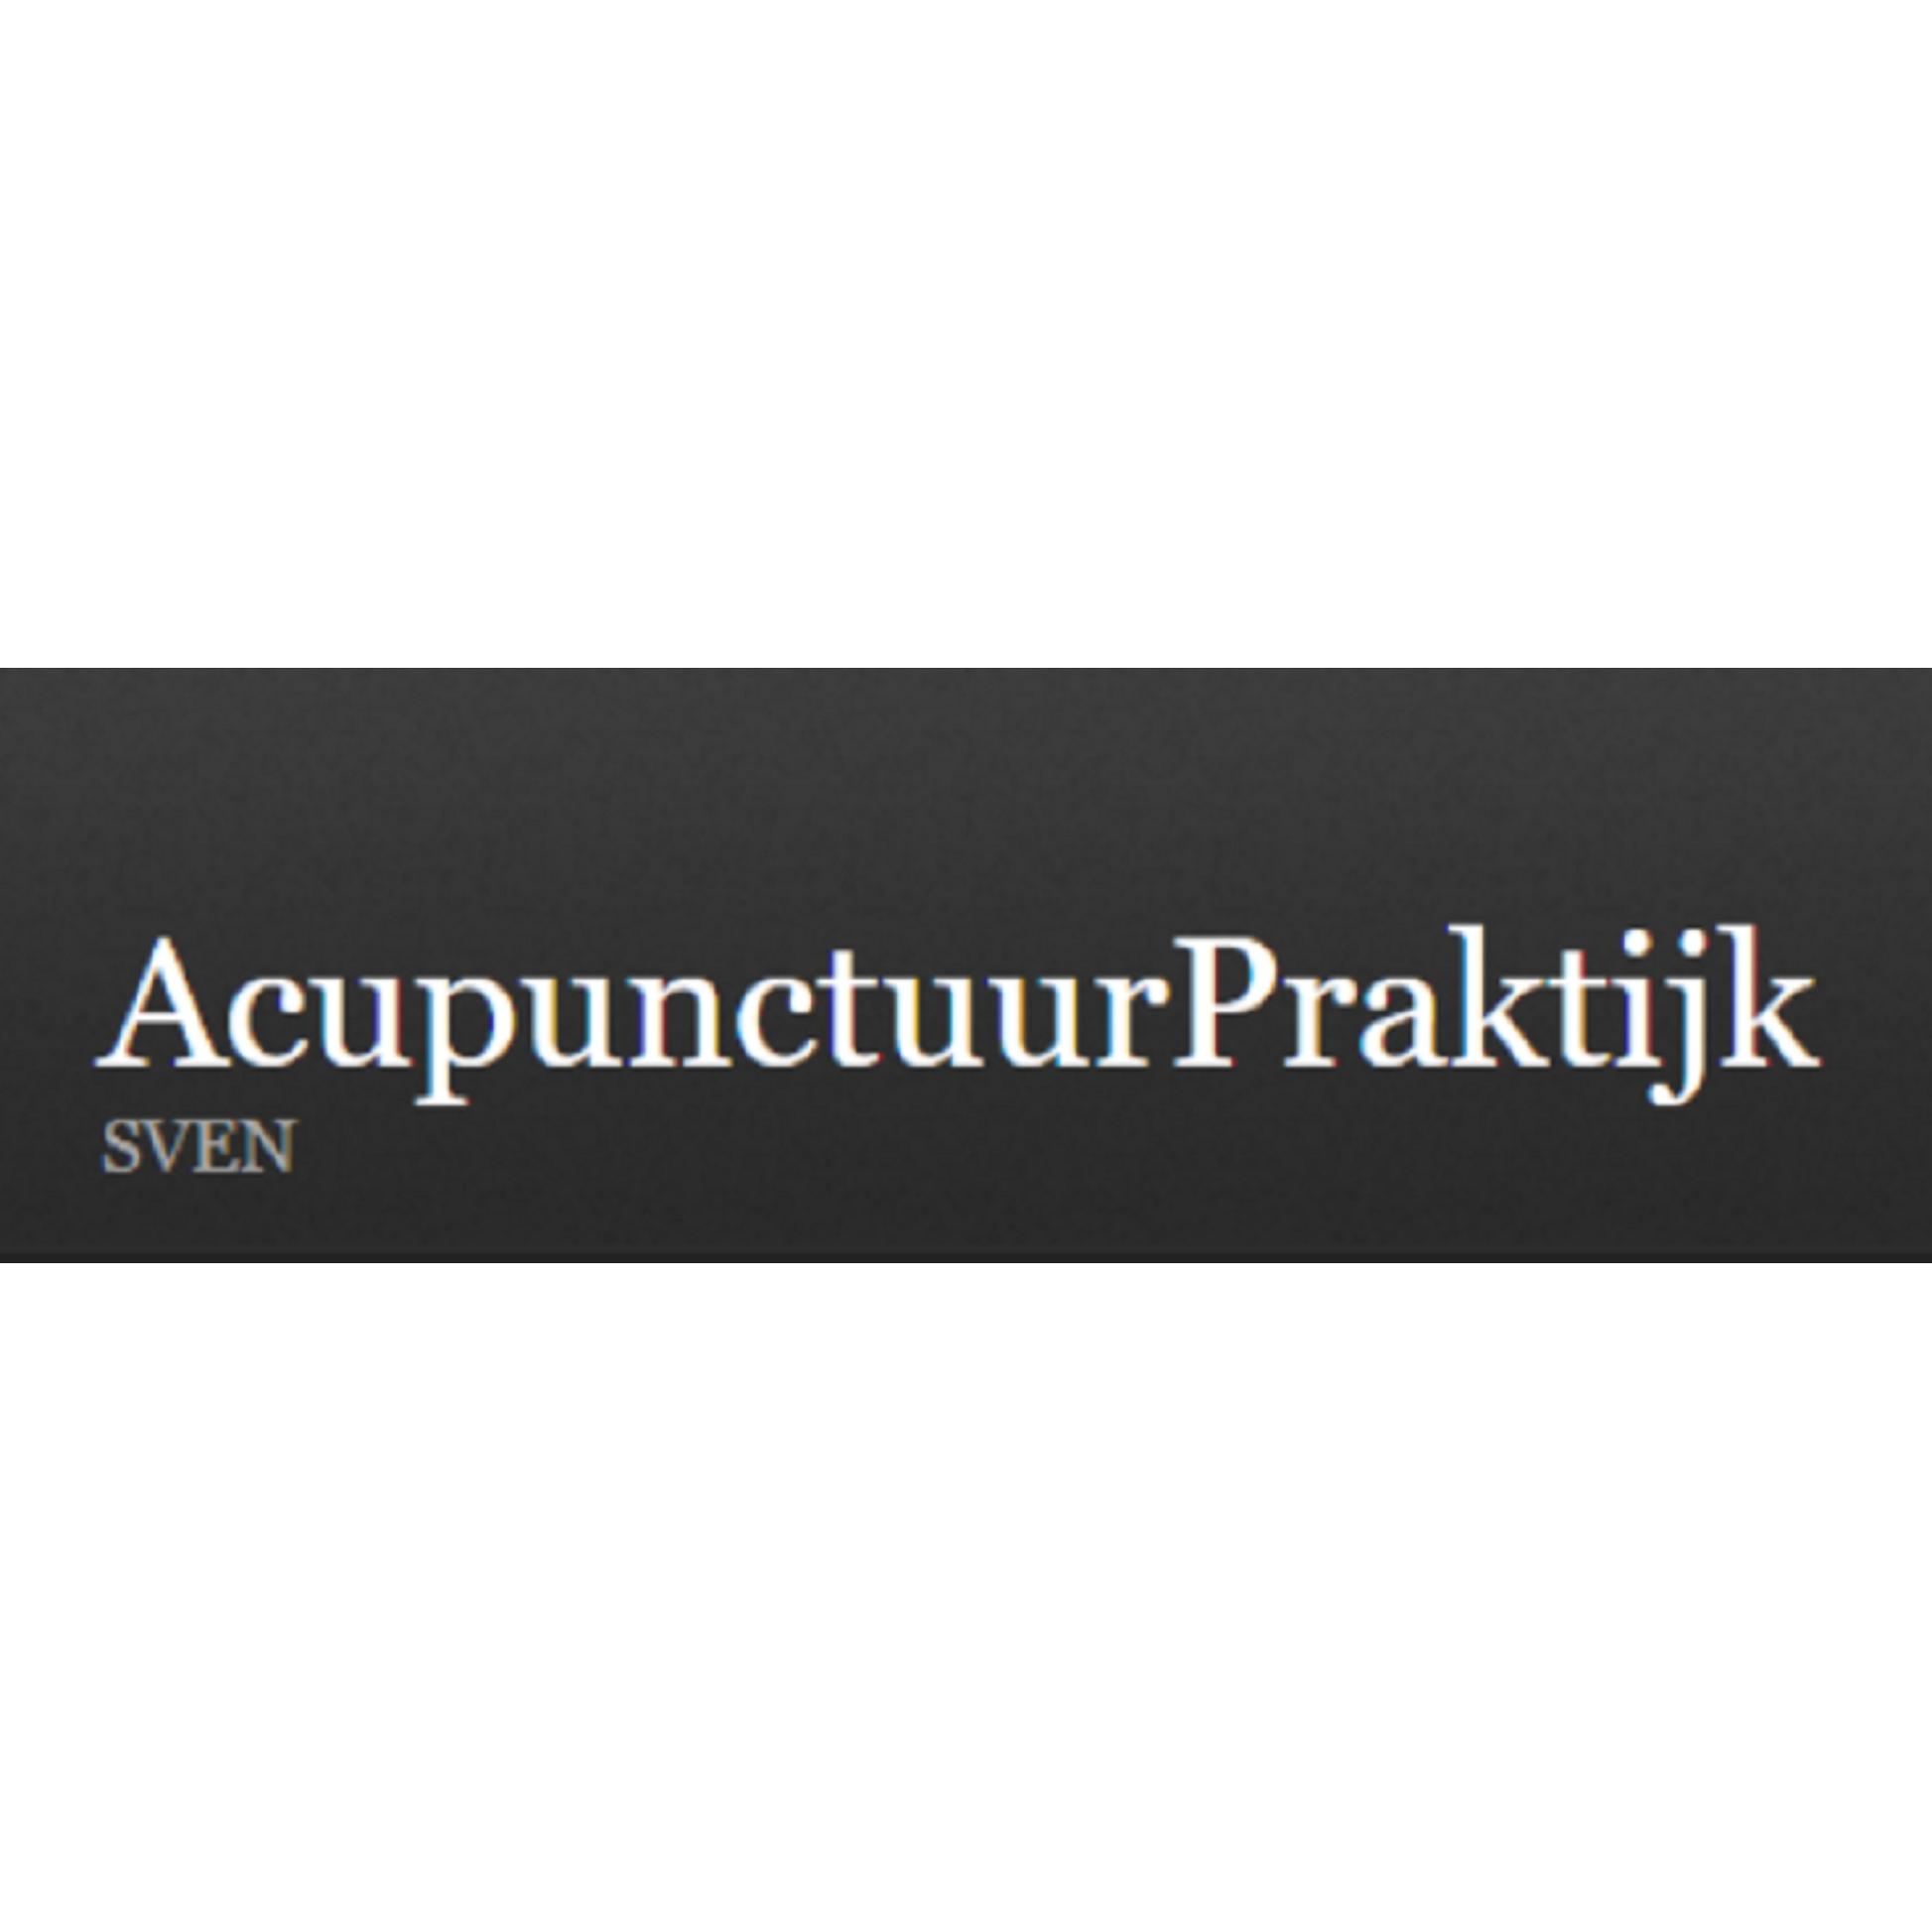 Acupunctuurpraktijk  Sven